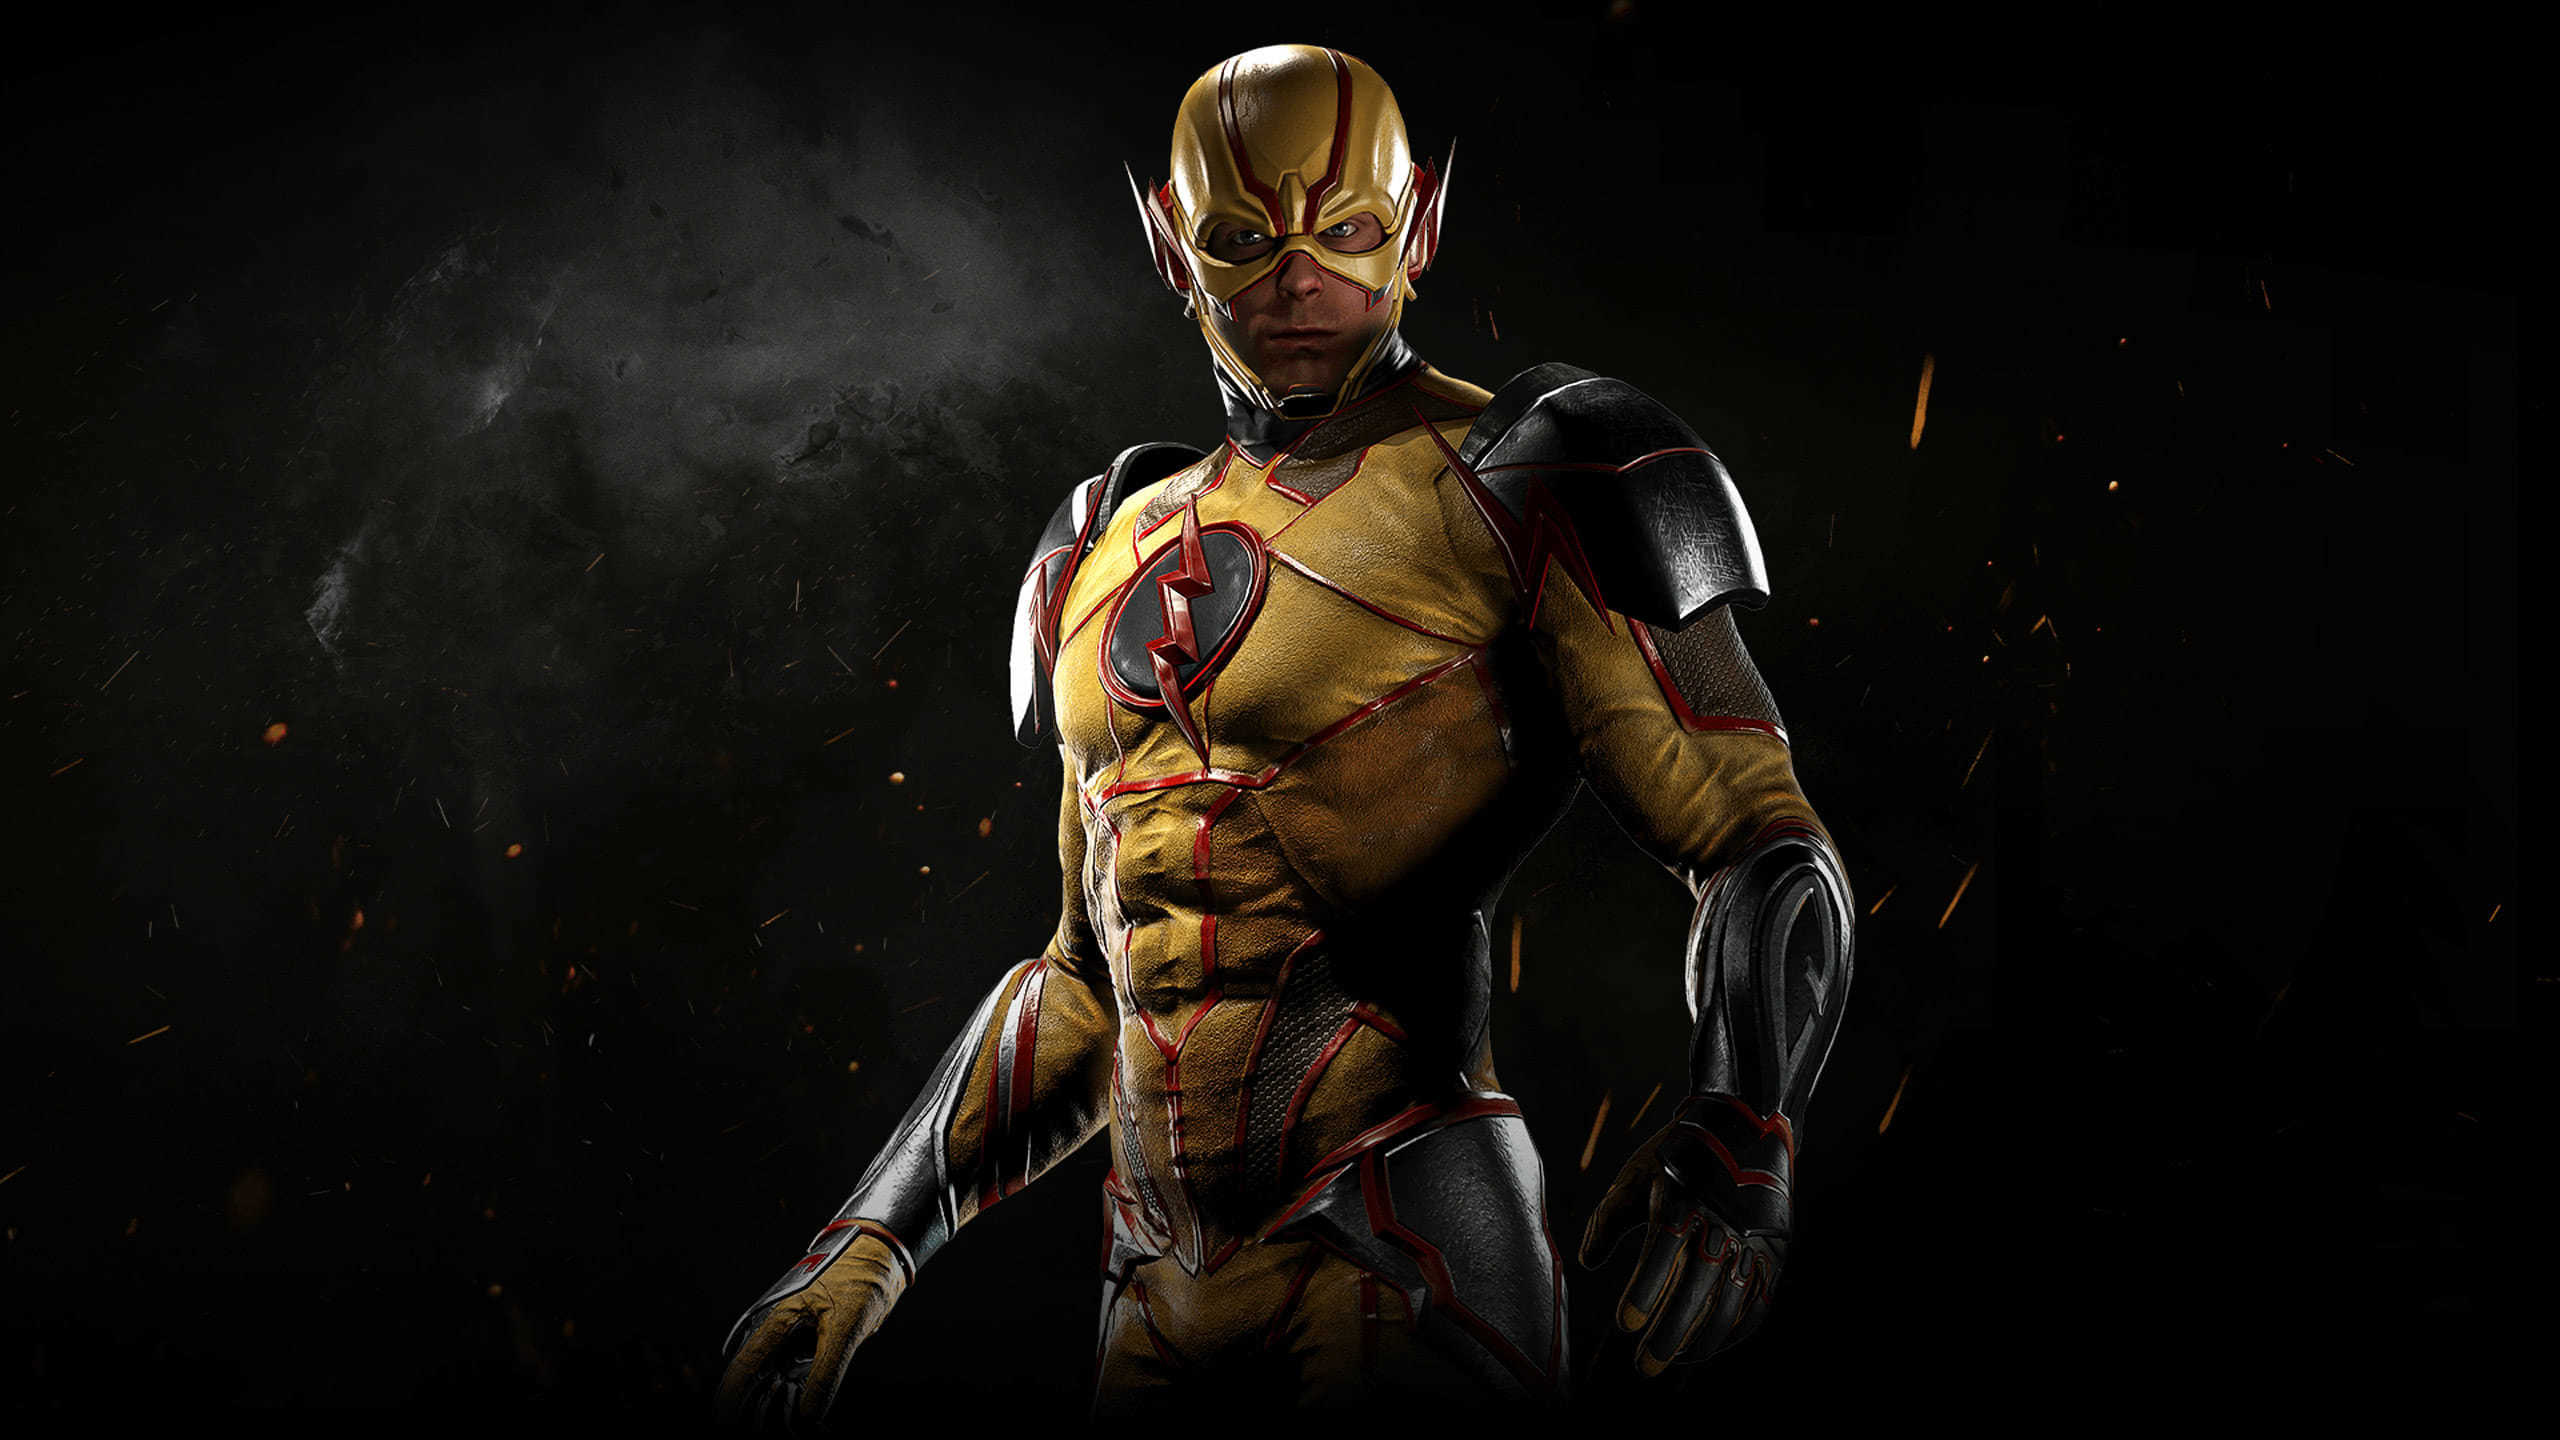 injustice 2 reverse flash wqhd 1440p wallpaper